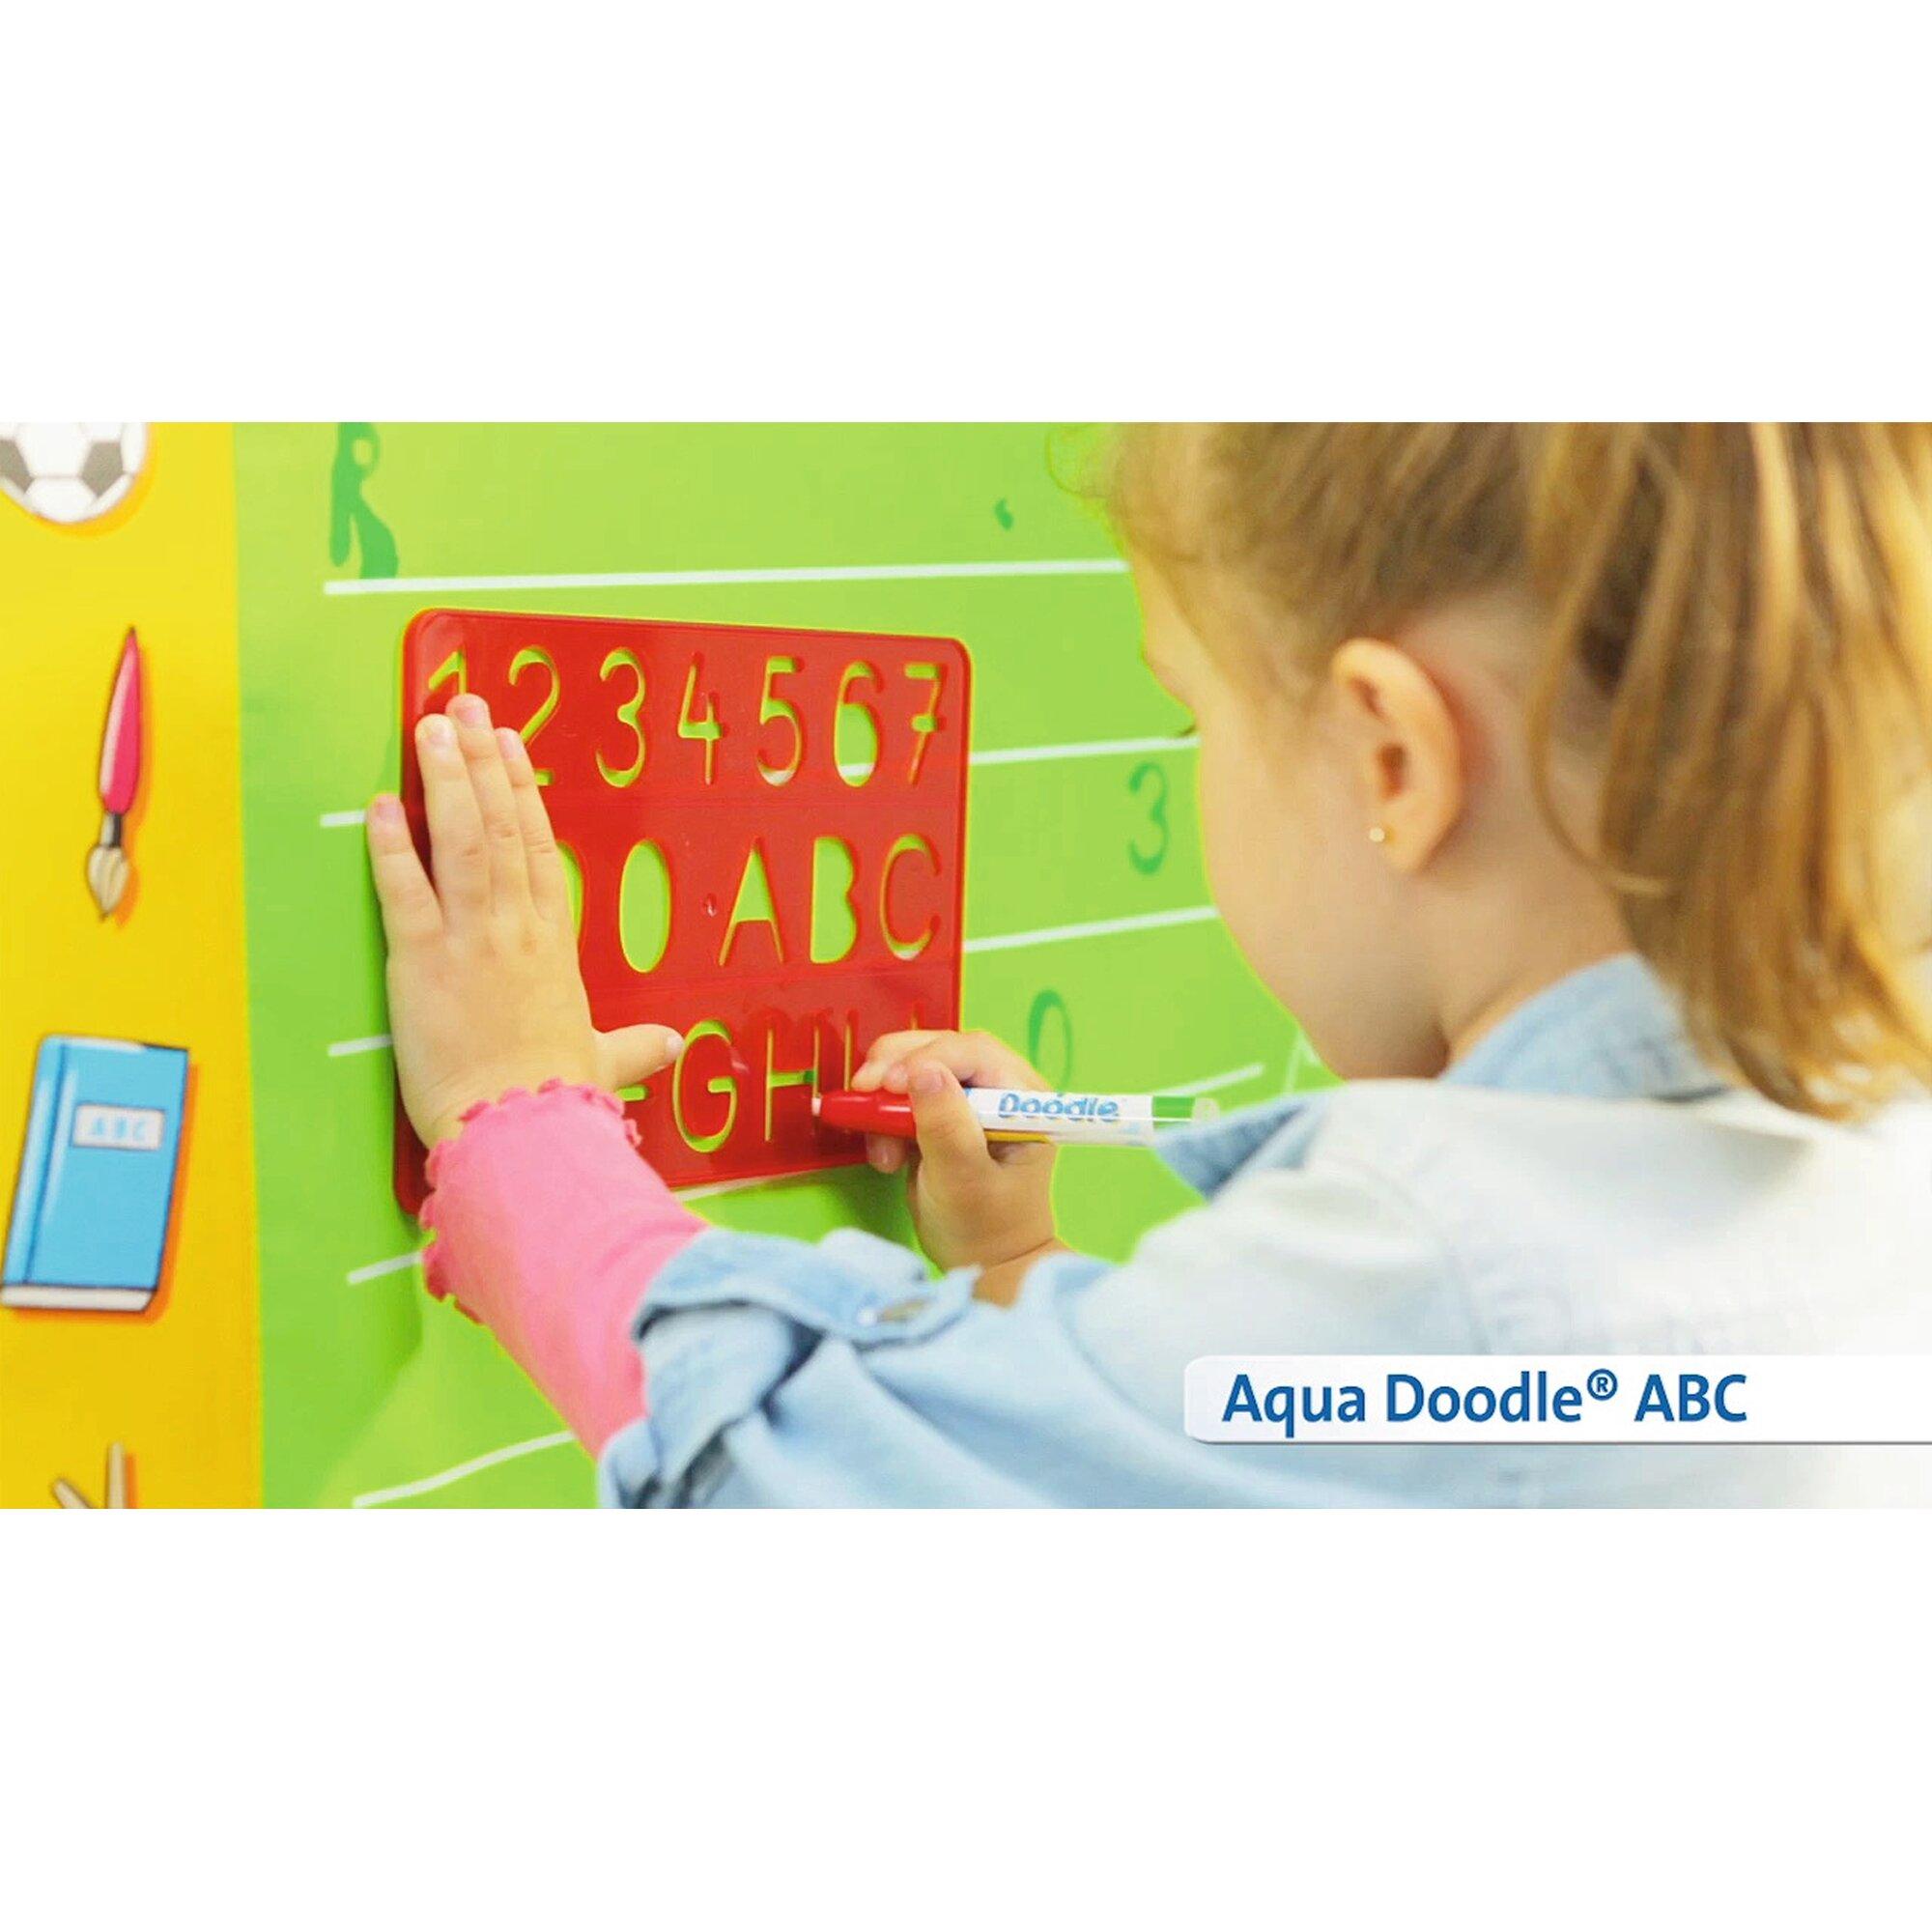 Ministeps Aqua Doodle® ABC